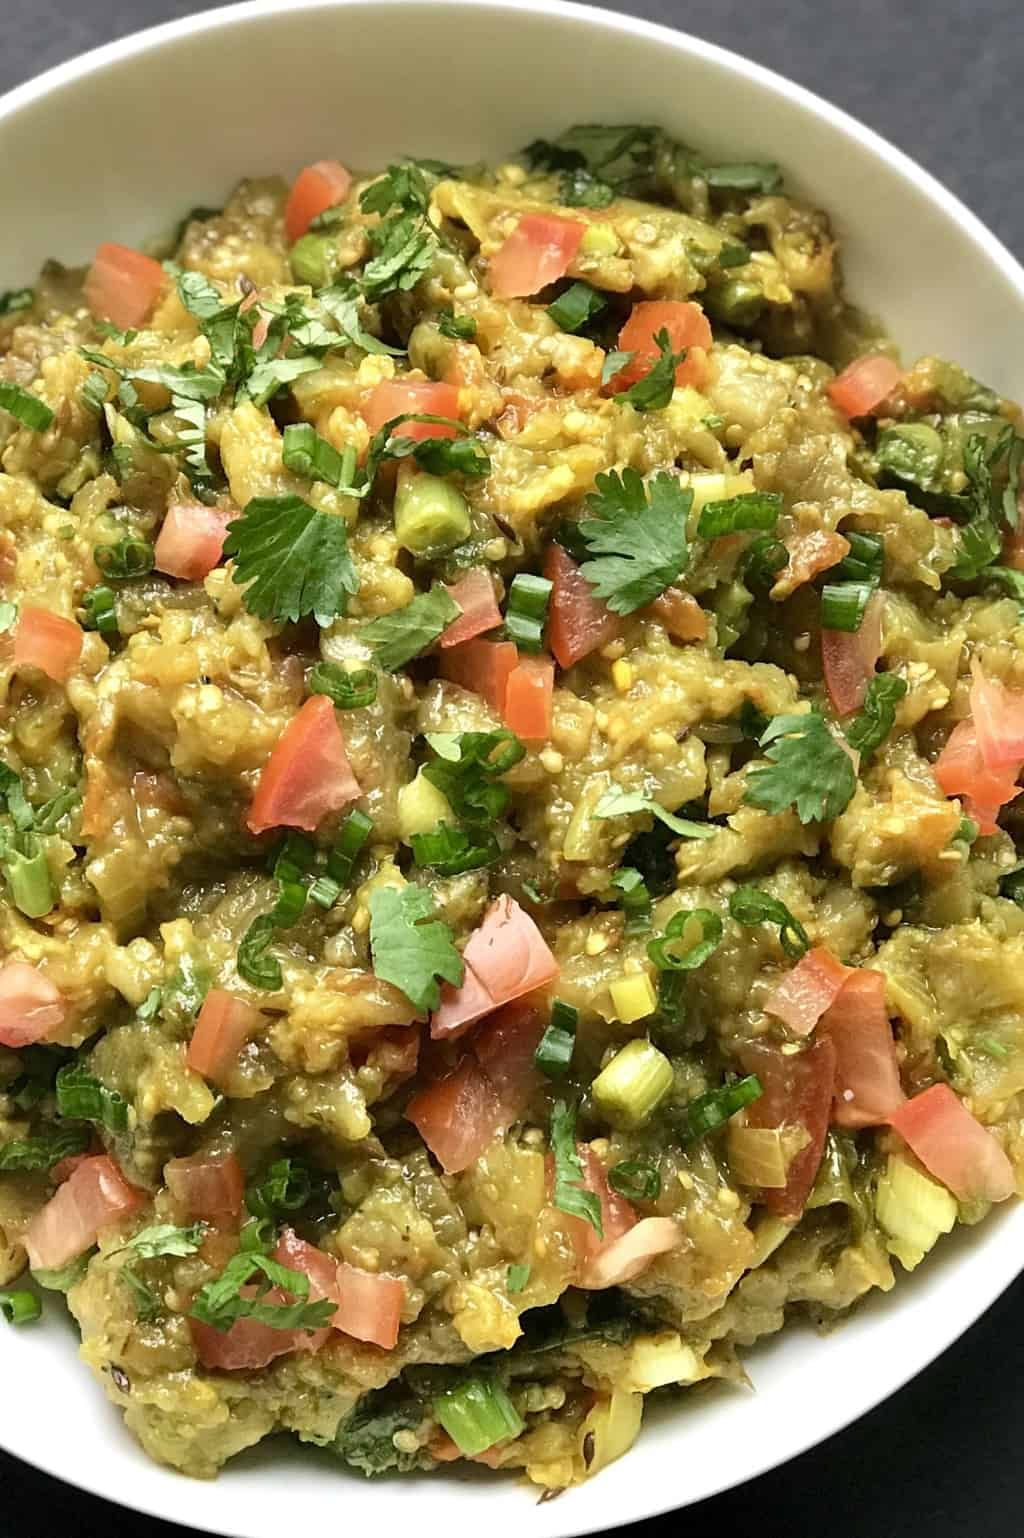 Baingan Bharta Recipe Using Instant Pot Ministry Of Curry Recipe In 2020 Bharta Recipe Indian Vegetarian Dishes Indian Food Recipes